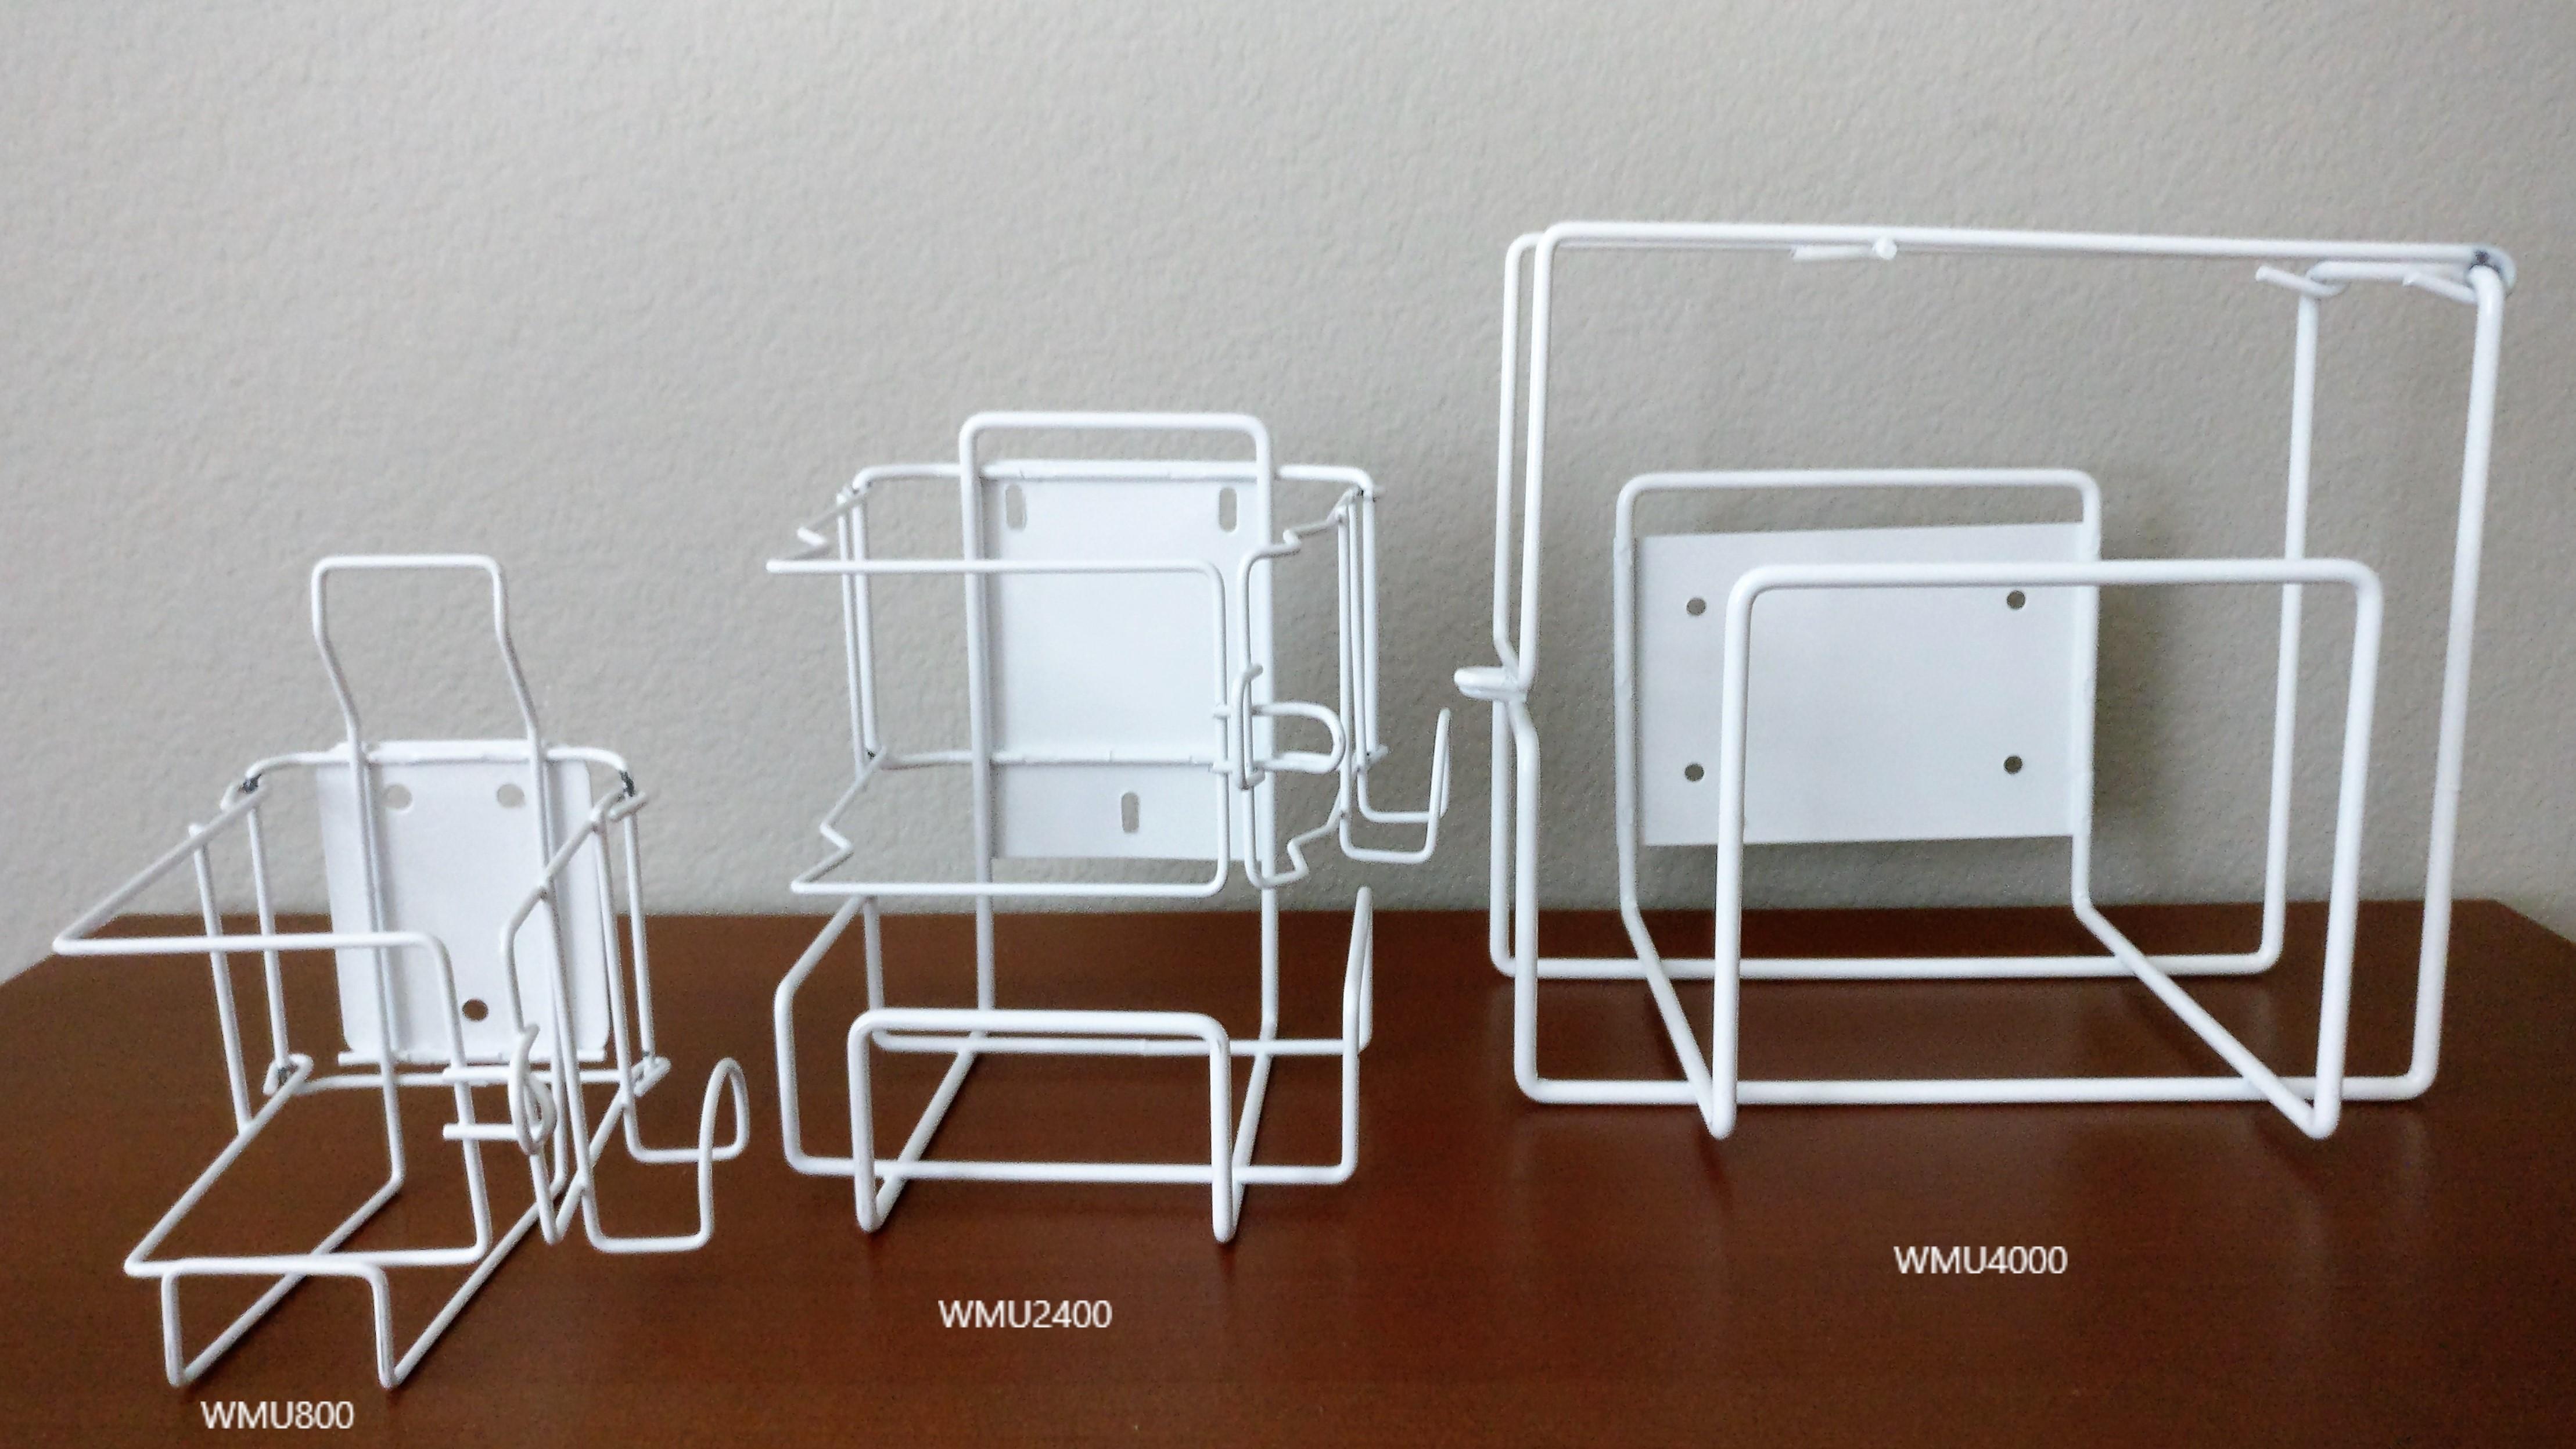 wall-mounts.jpg